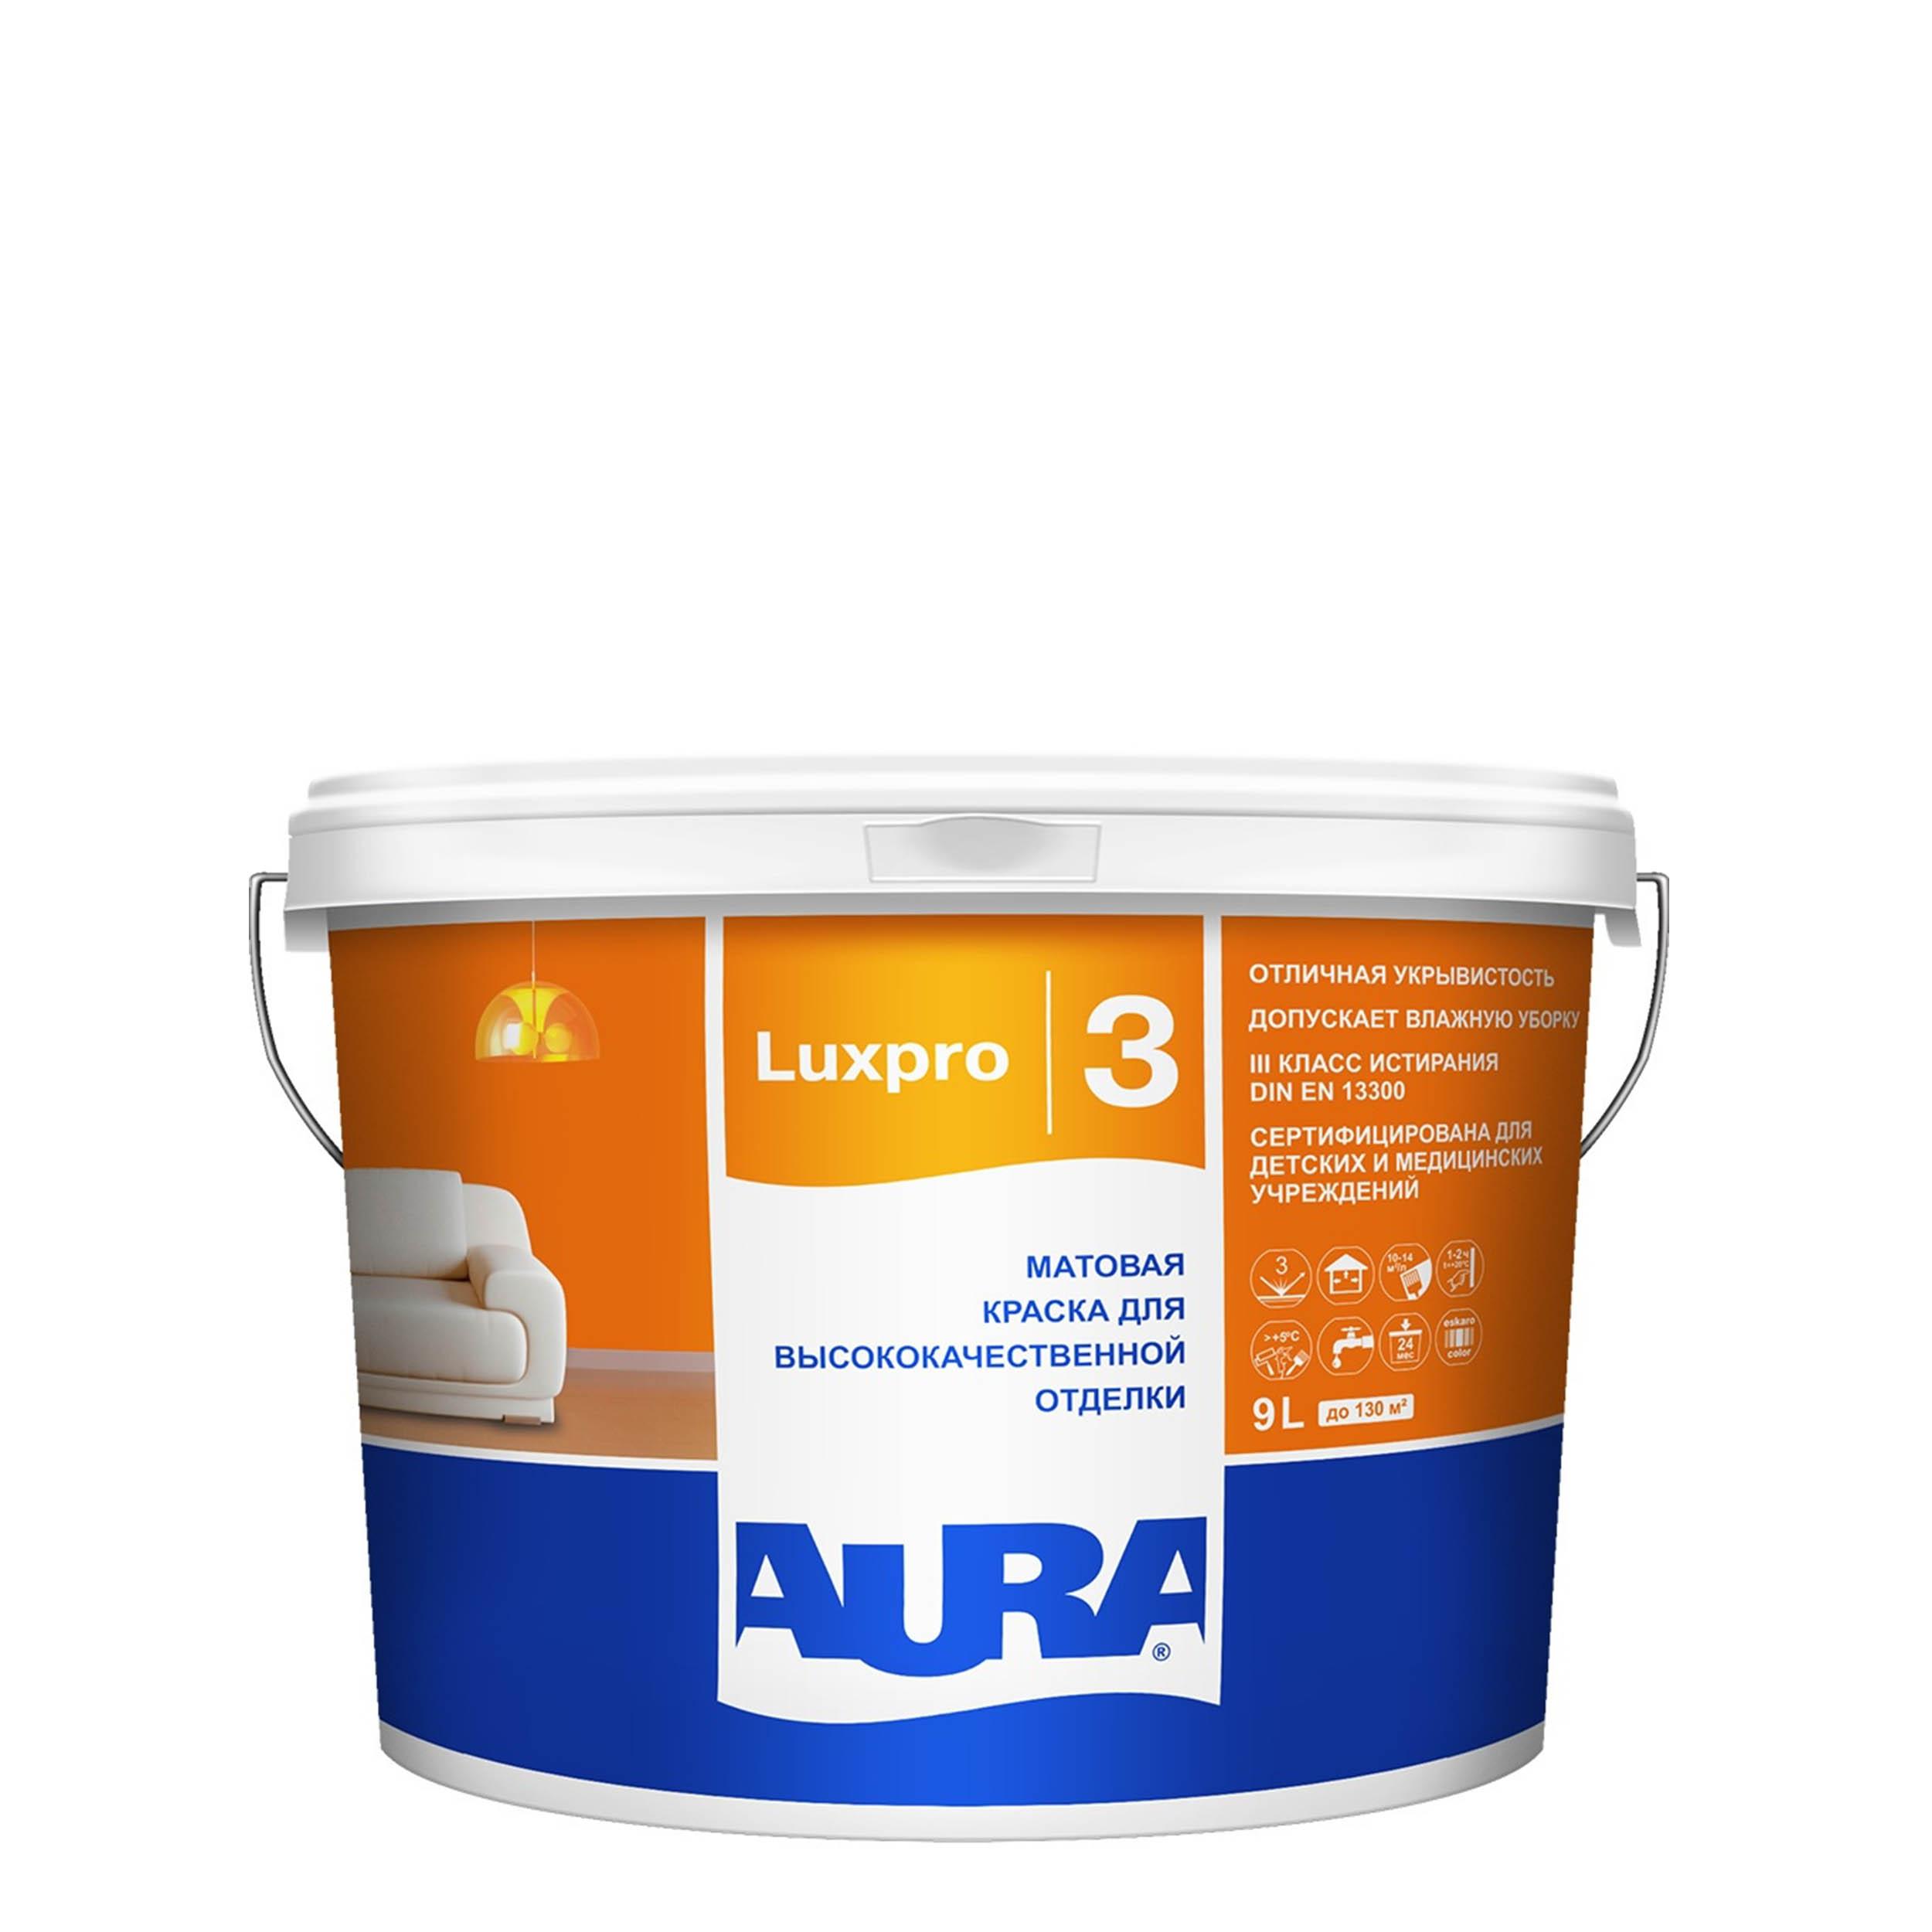 Фото 3 - Краска интерьерная, Aura LuxPRO 3, RAL 7024, 11 кг.